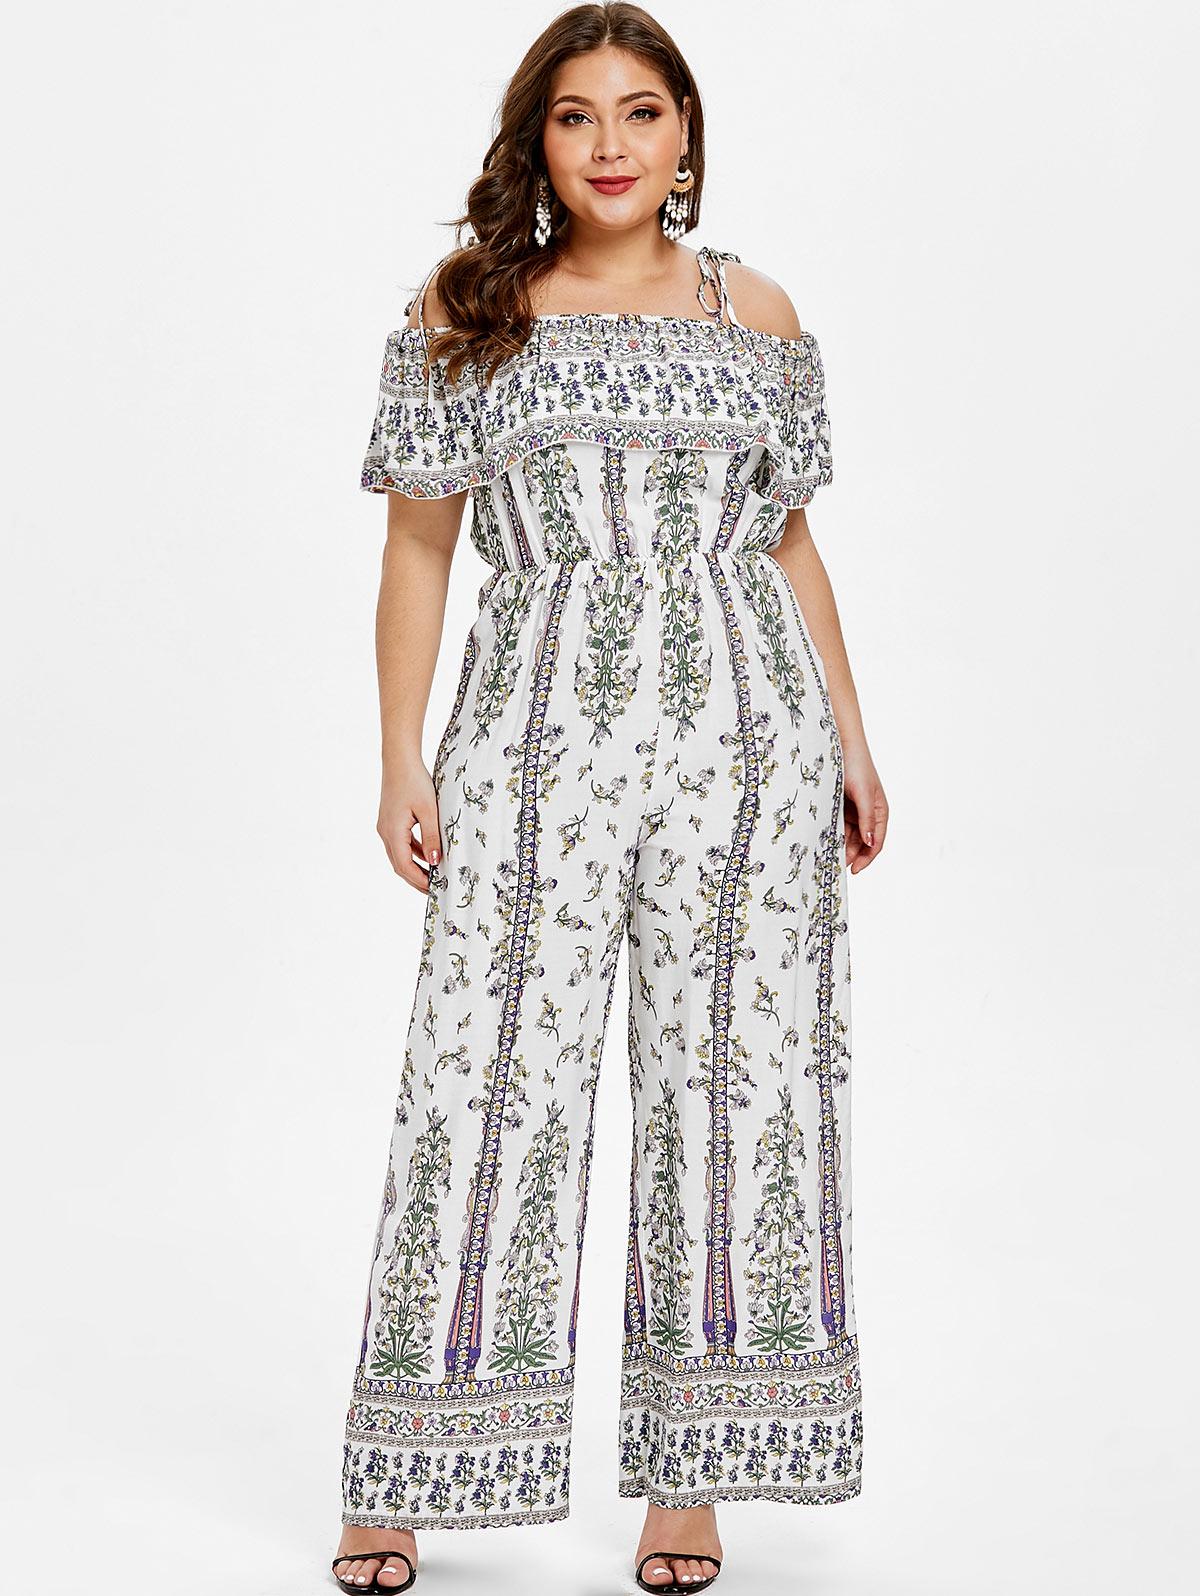 a25aa83ebd18 2019 Wipalo Women Plus Size Ruffle Panel Floral Print Jumpsuit Boho ...